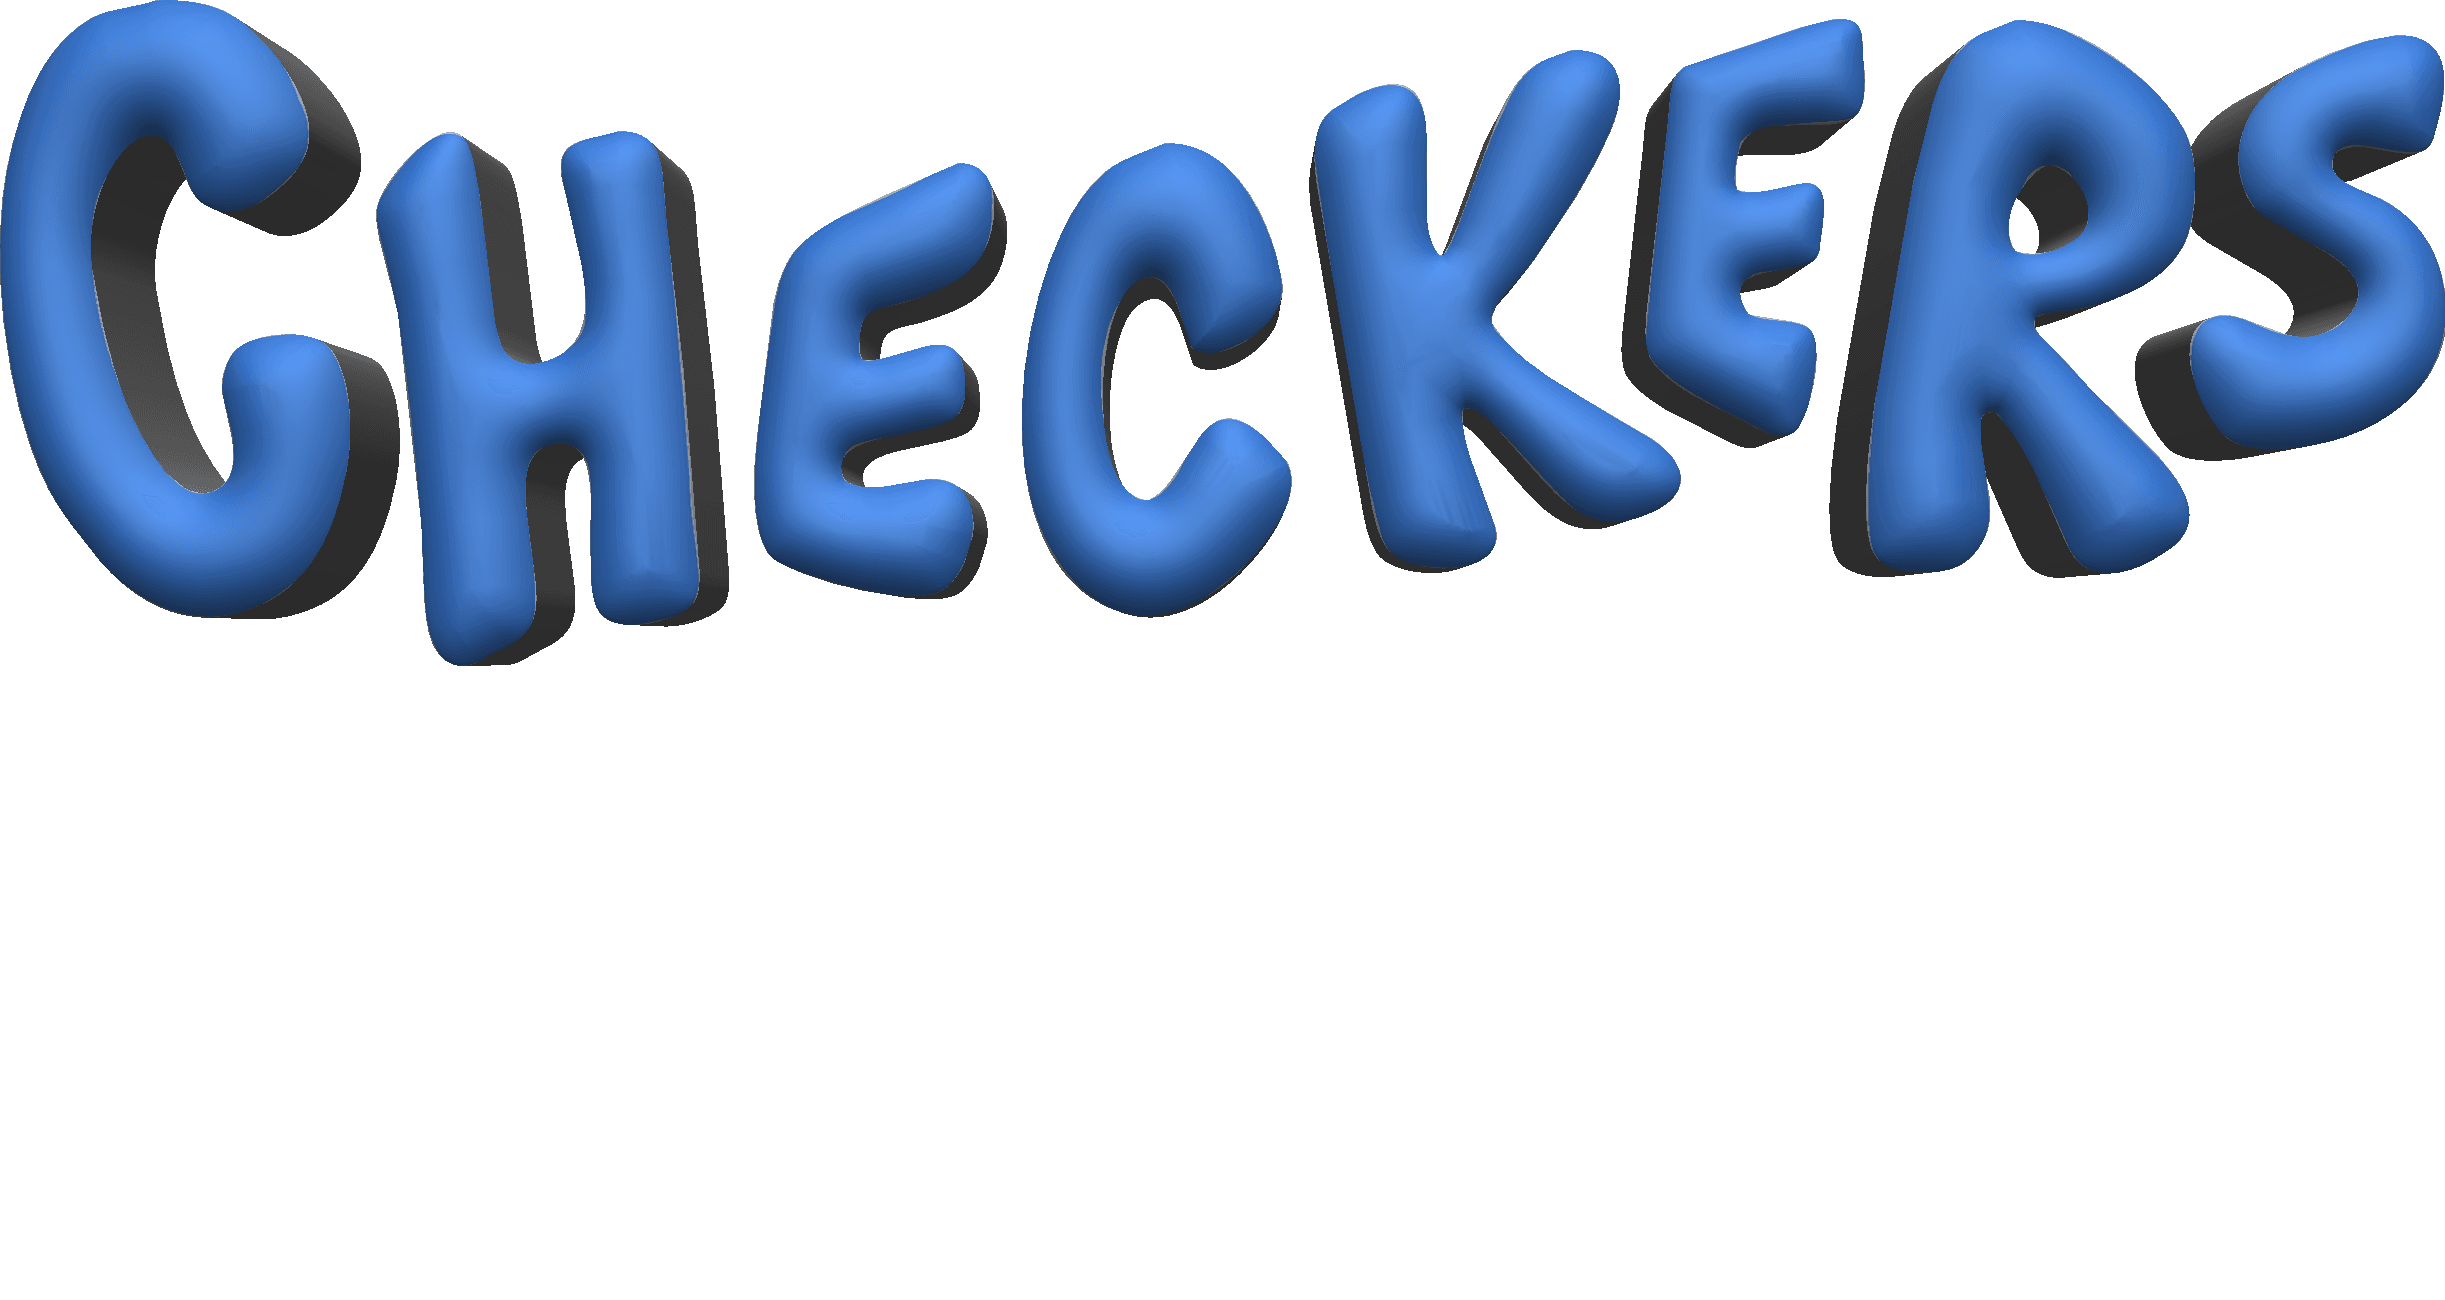 Special October Checkers TV